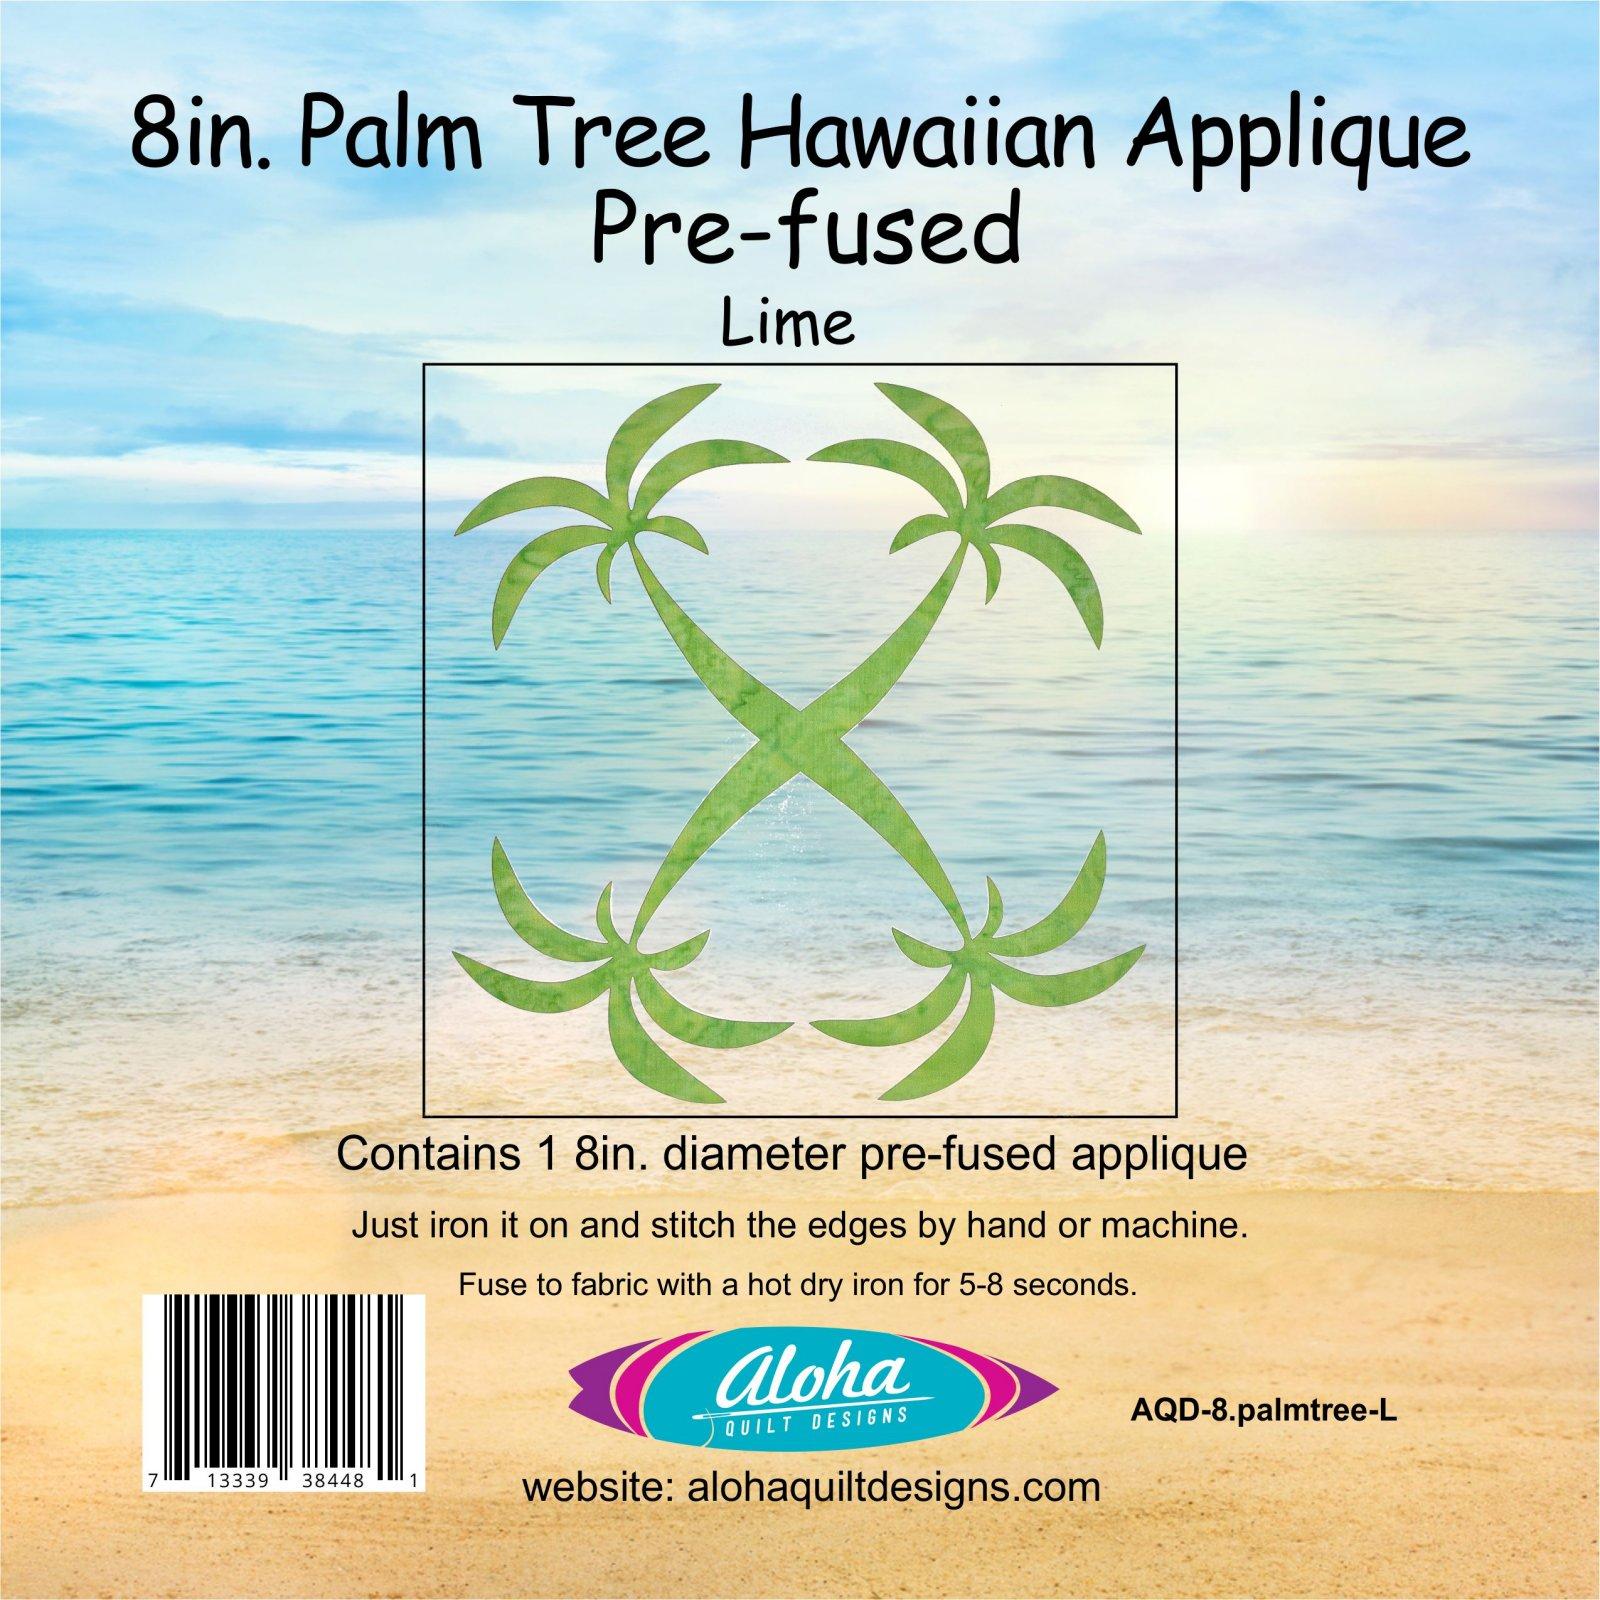 8in. Palmtree Hawaiian Fusible Applique